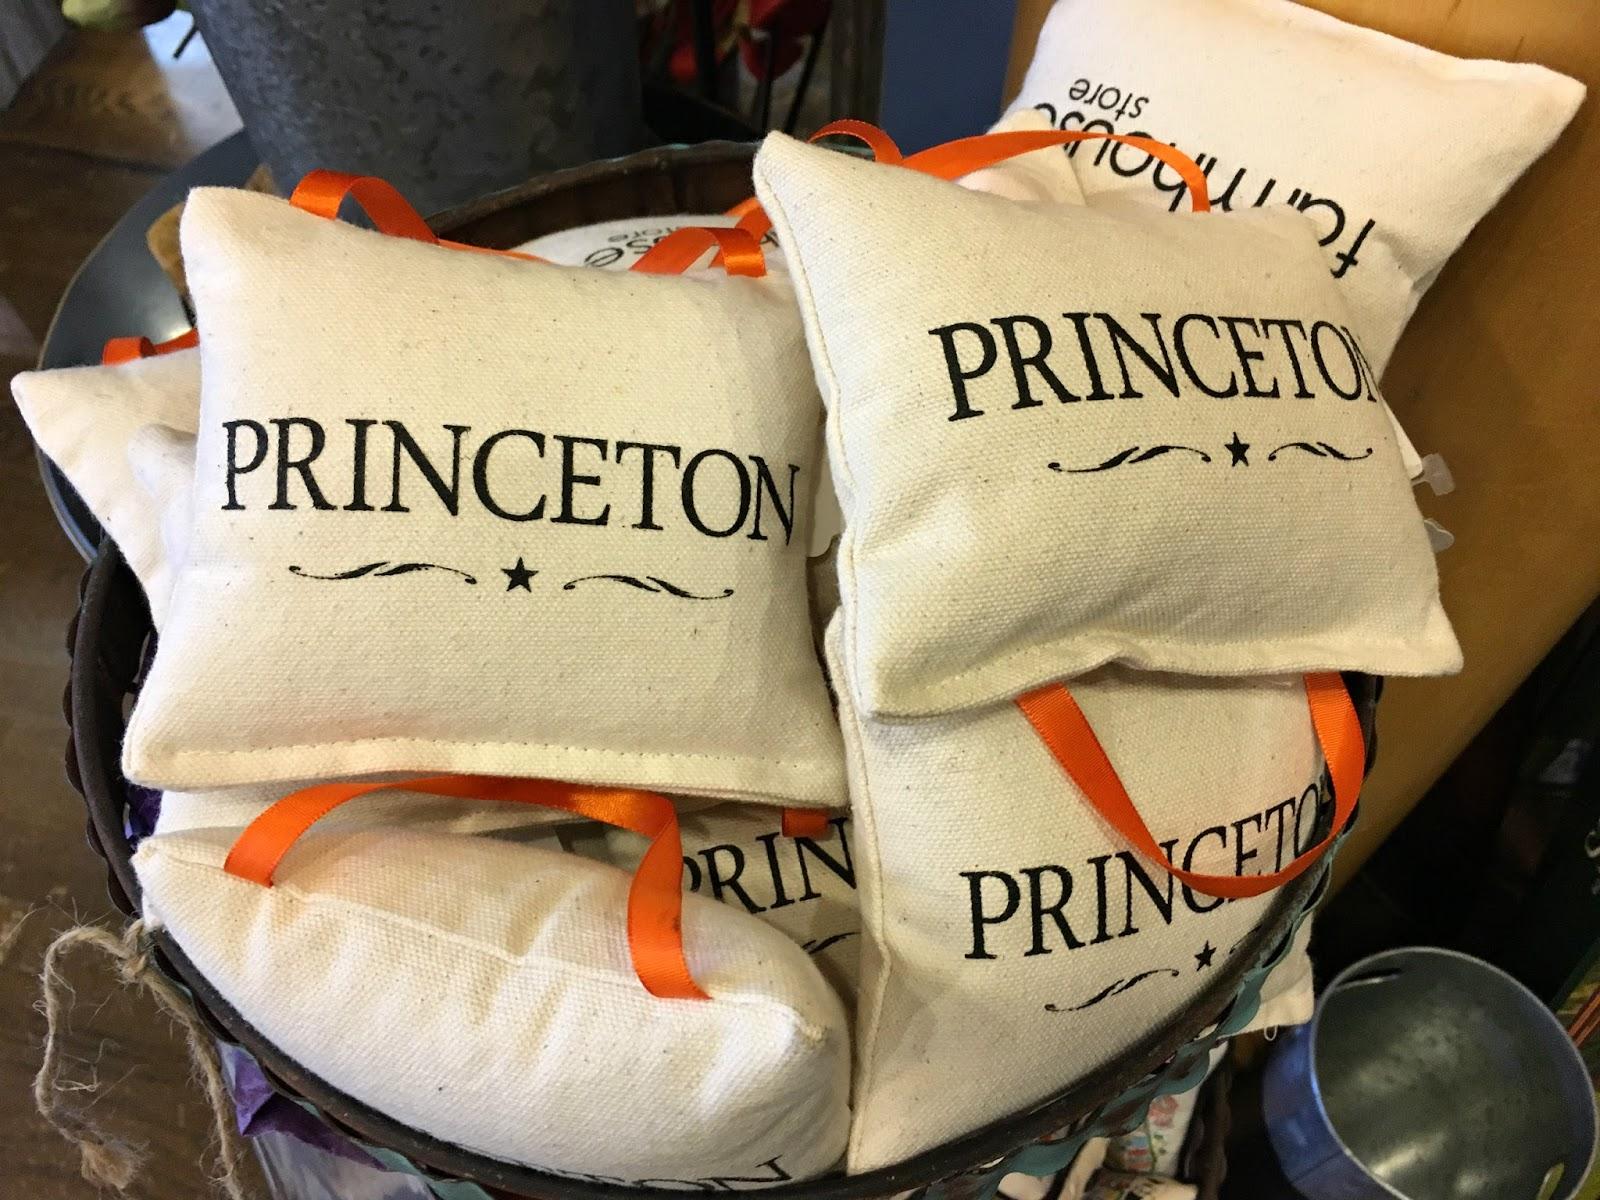 Princeton accessories